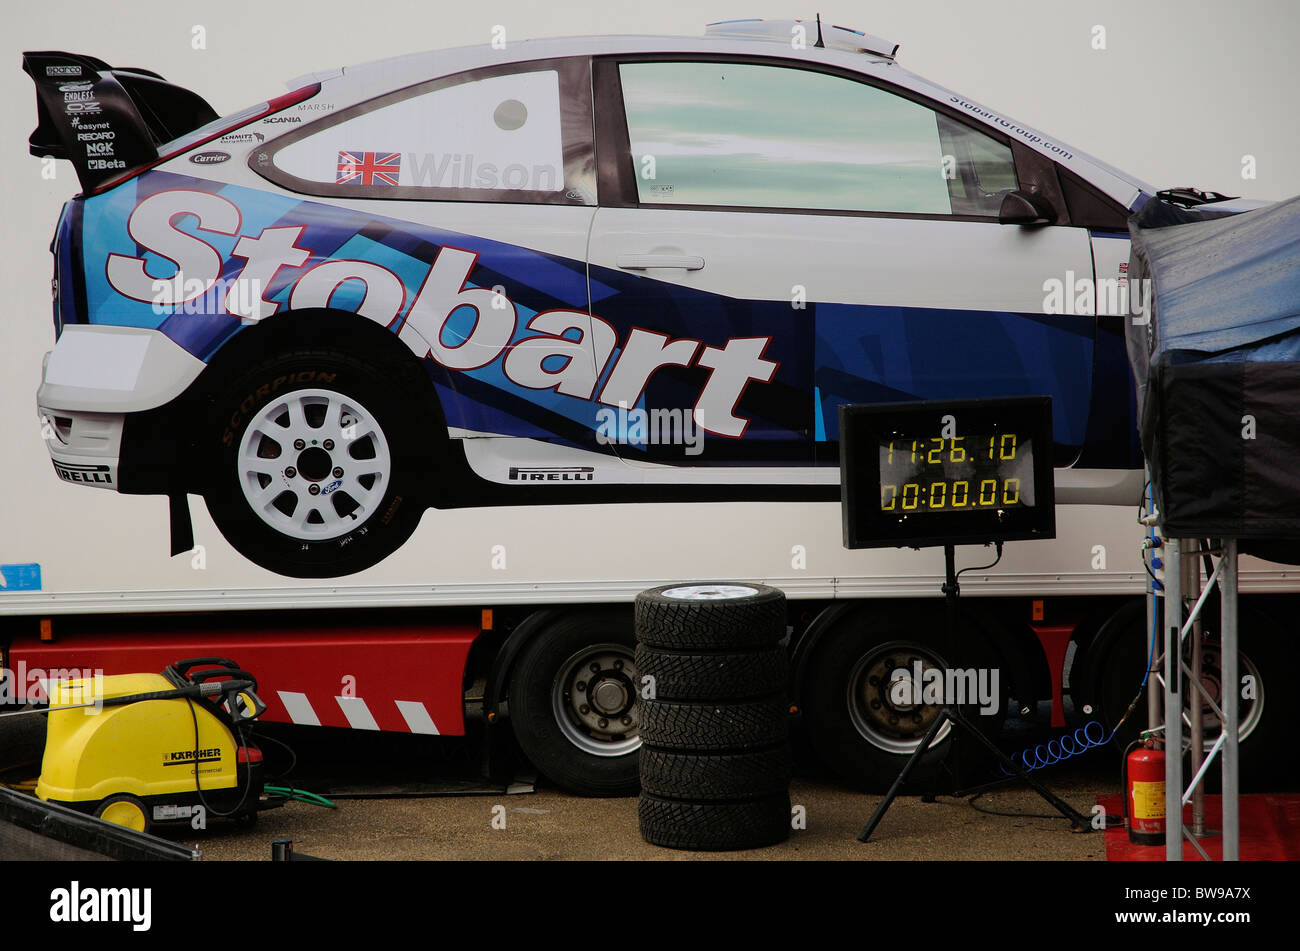 El piloto de Stobart motor sport truck Rally Team el transporte Imagen De Stock